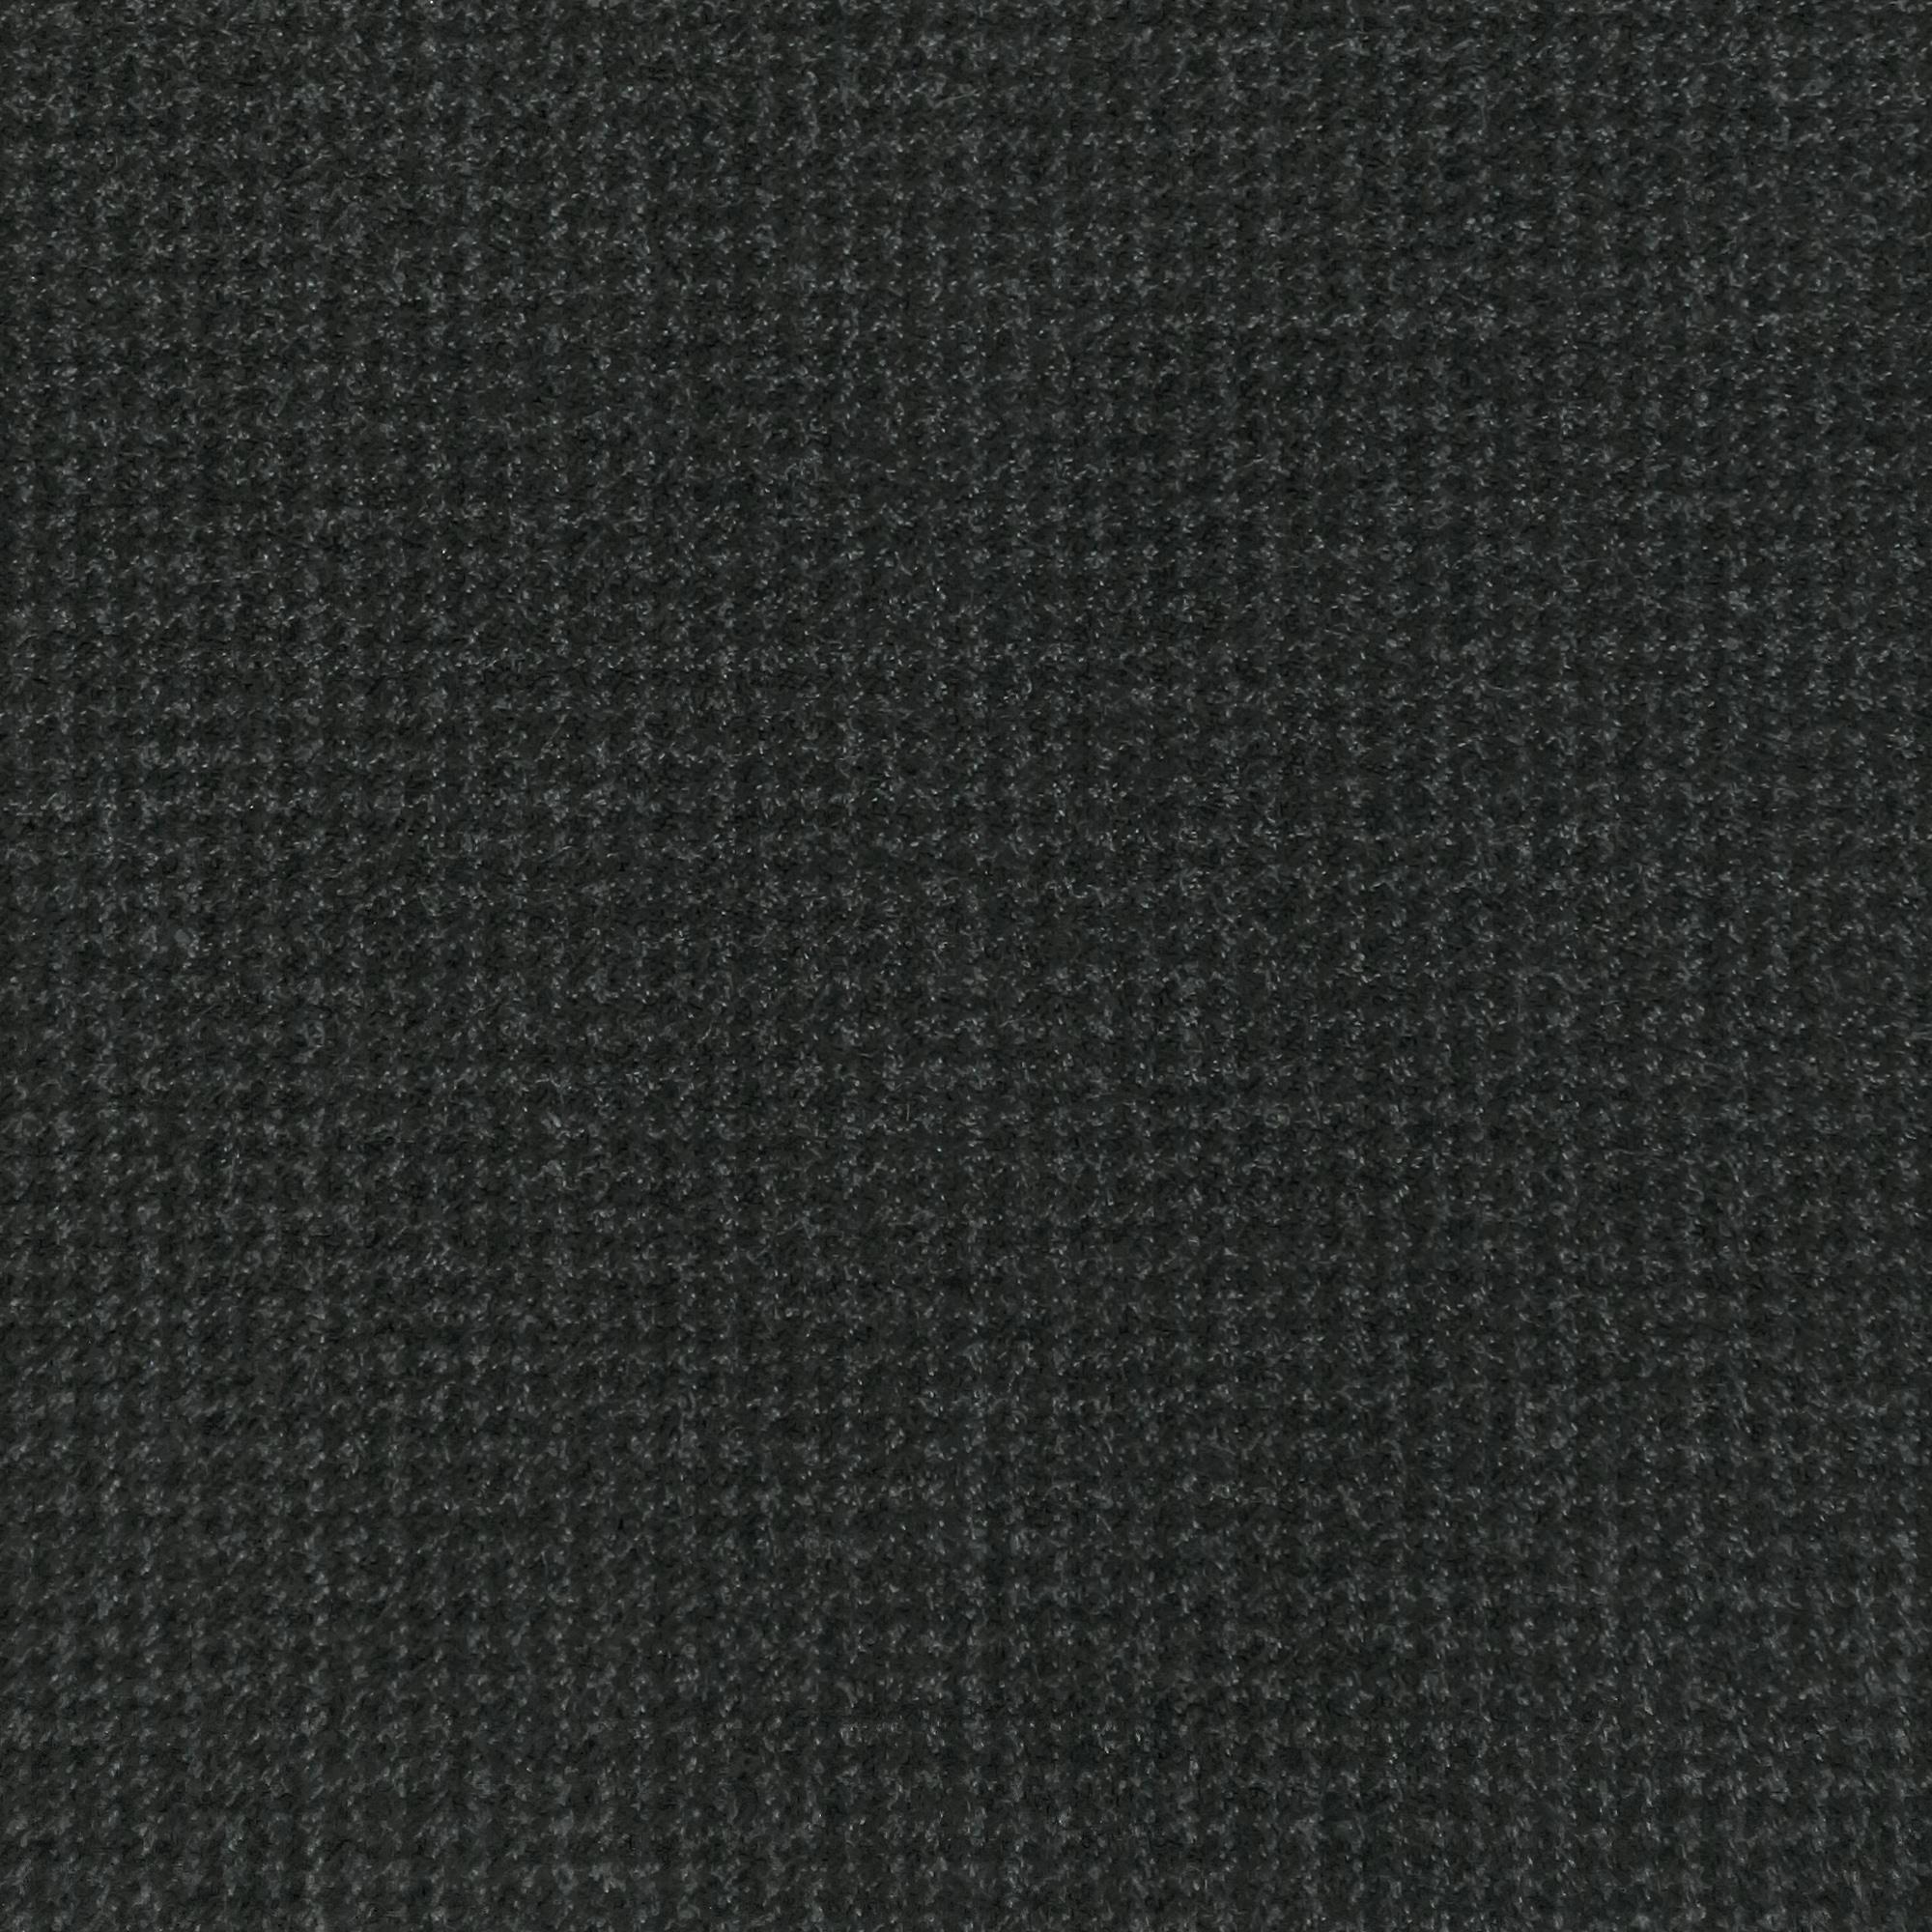 Sz032097 1